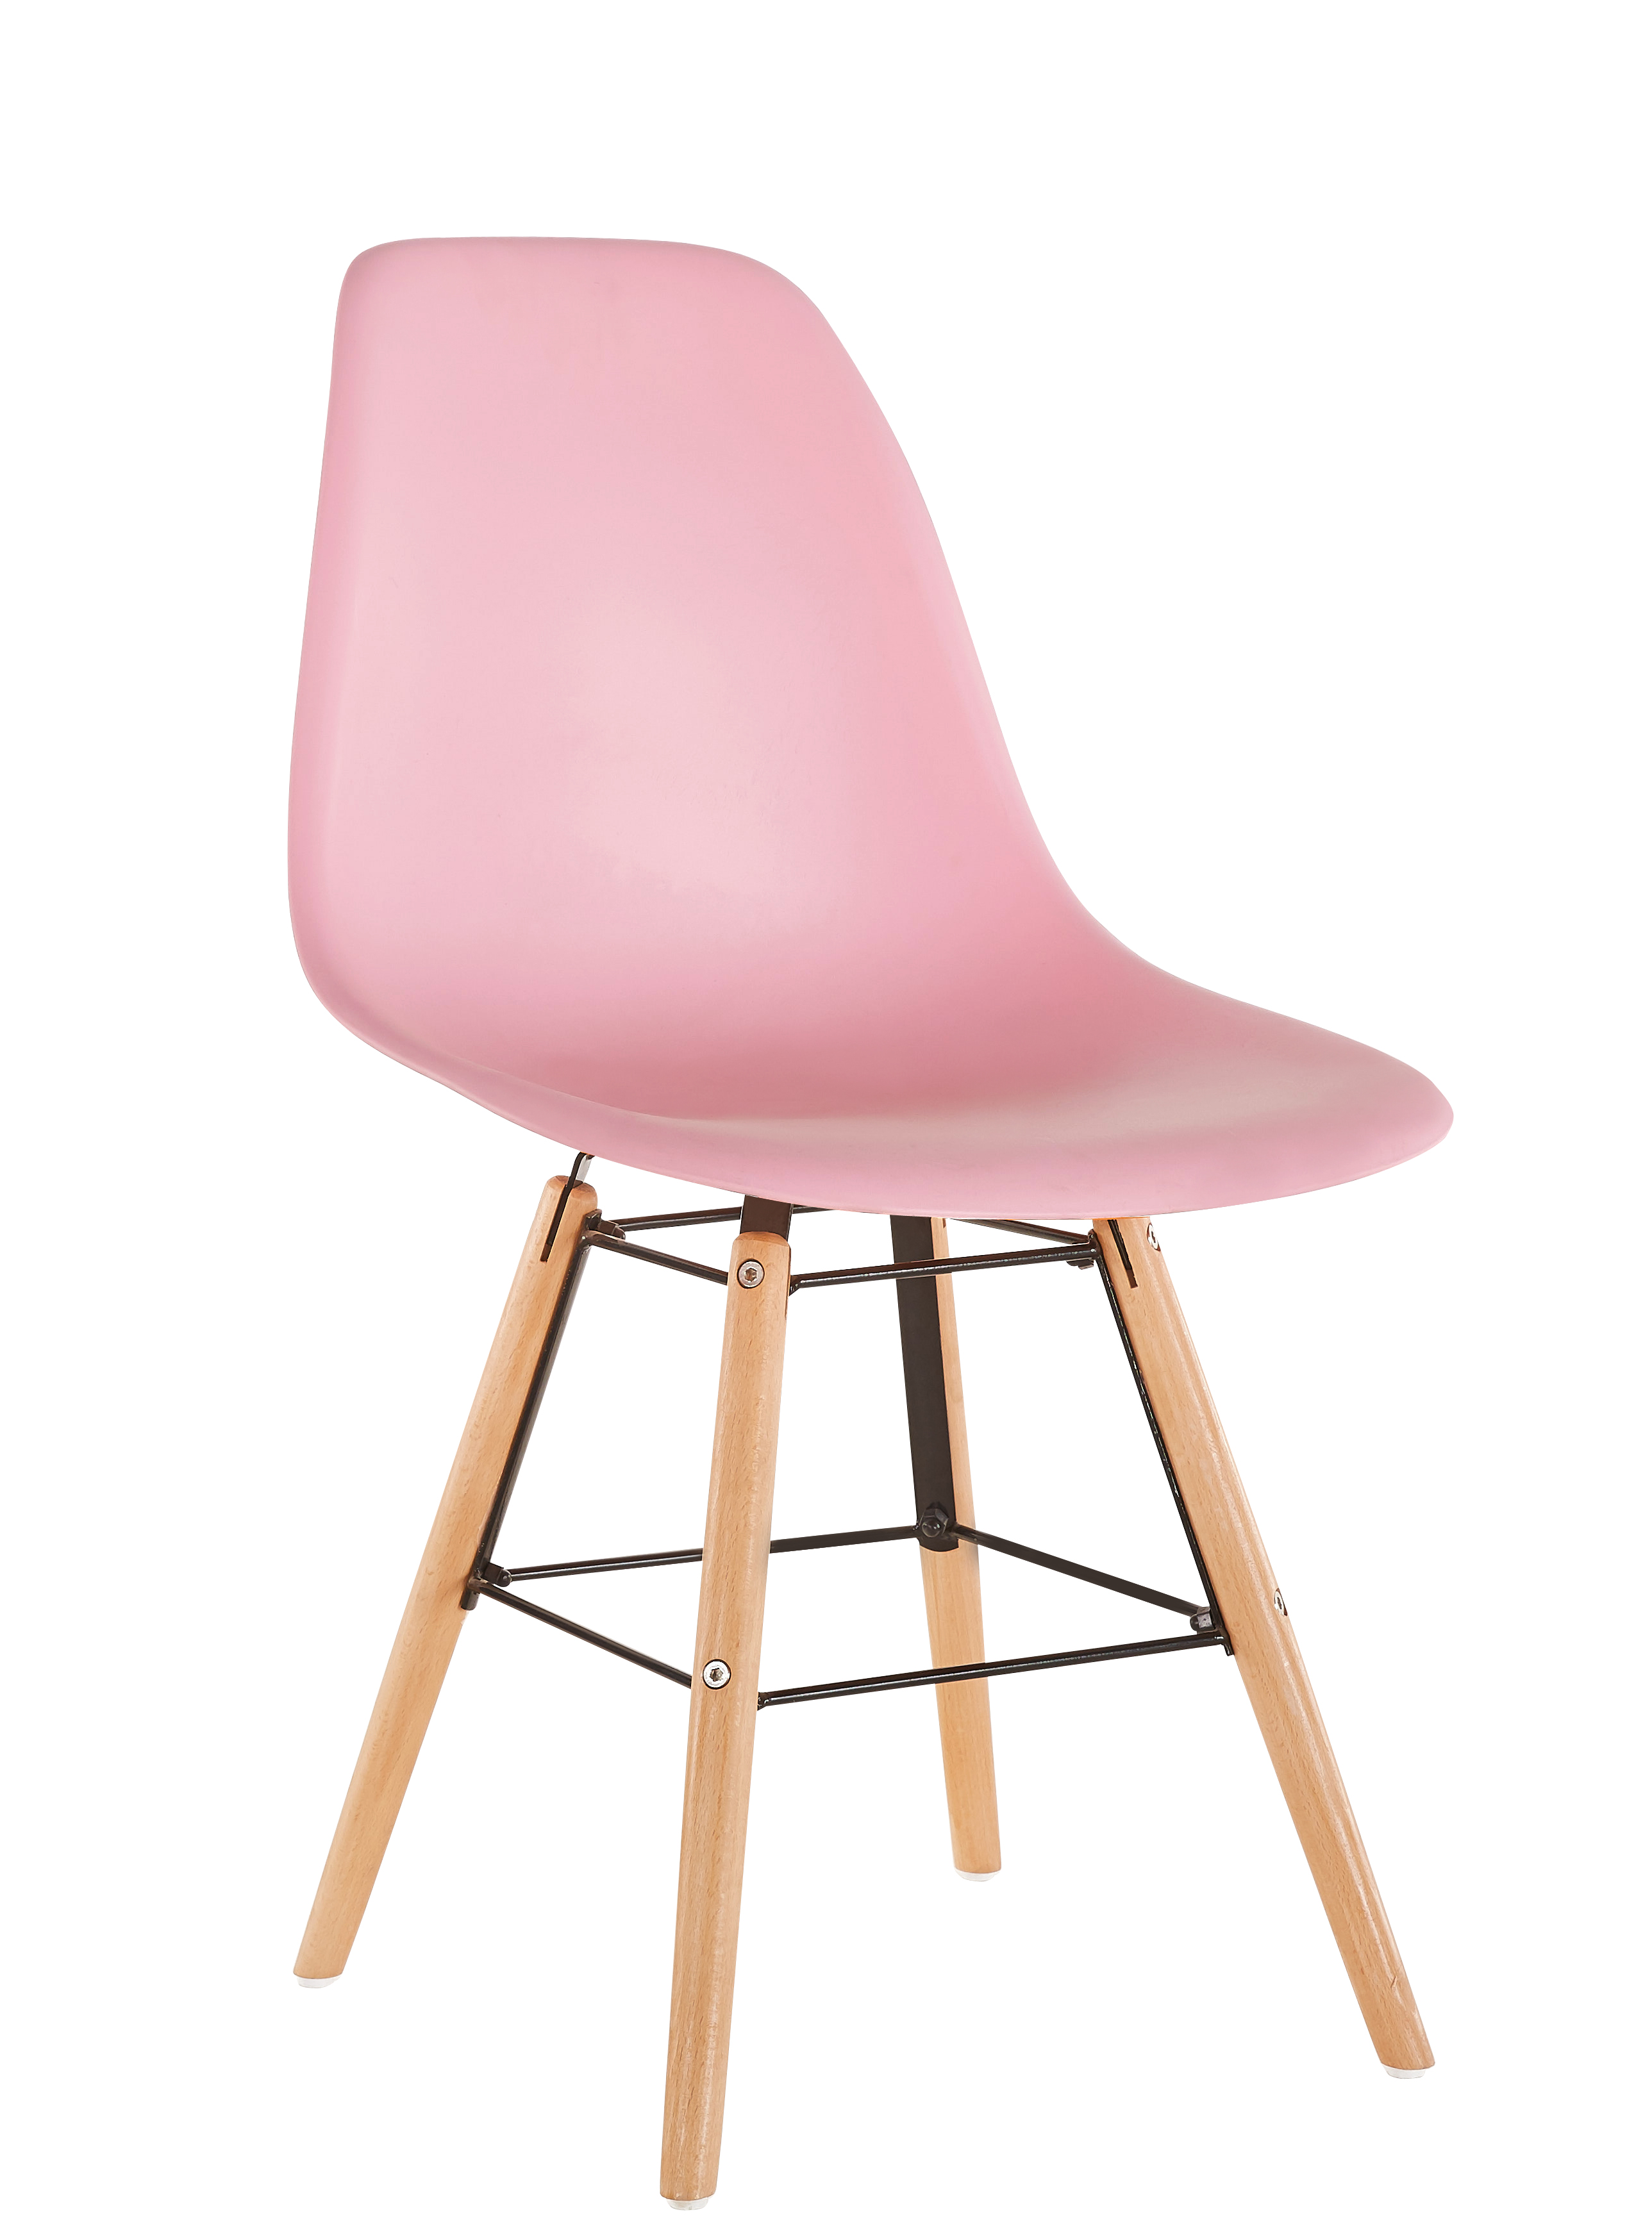 High Quality Modern Dinner Chair